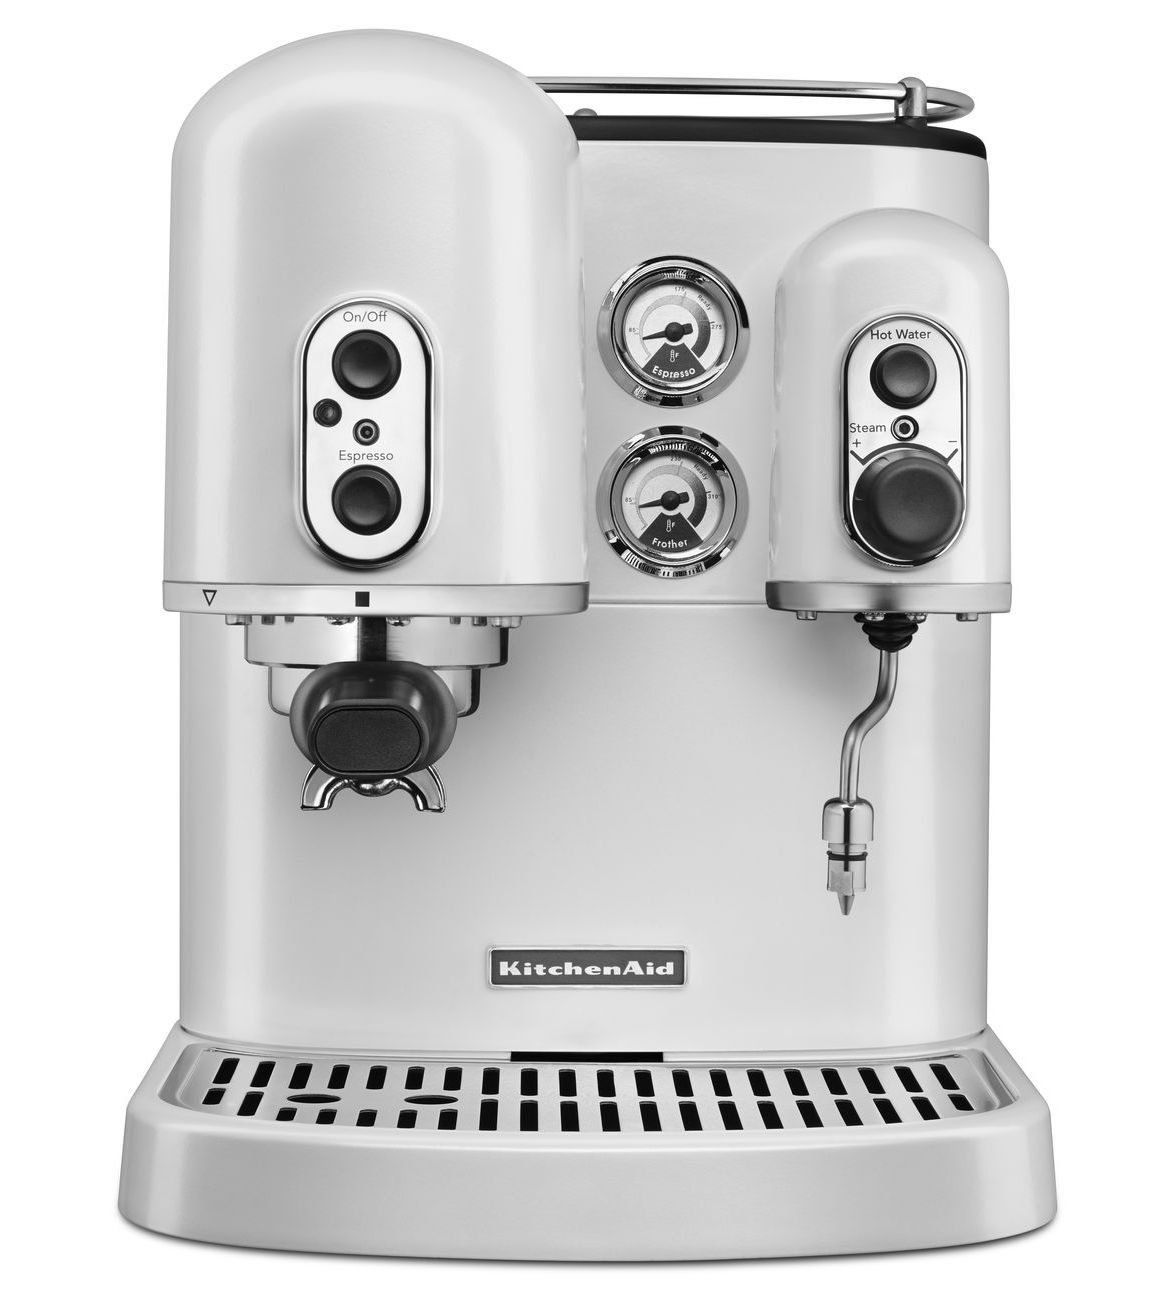 Amazoncom Kitchenaid Dual Boiler Manual Espresso Maker